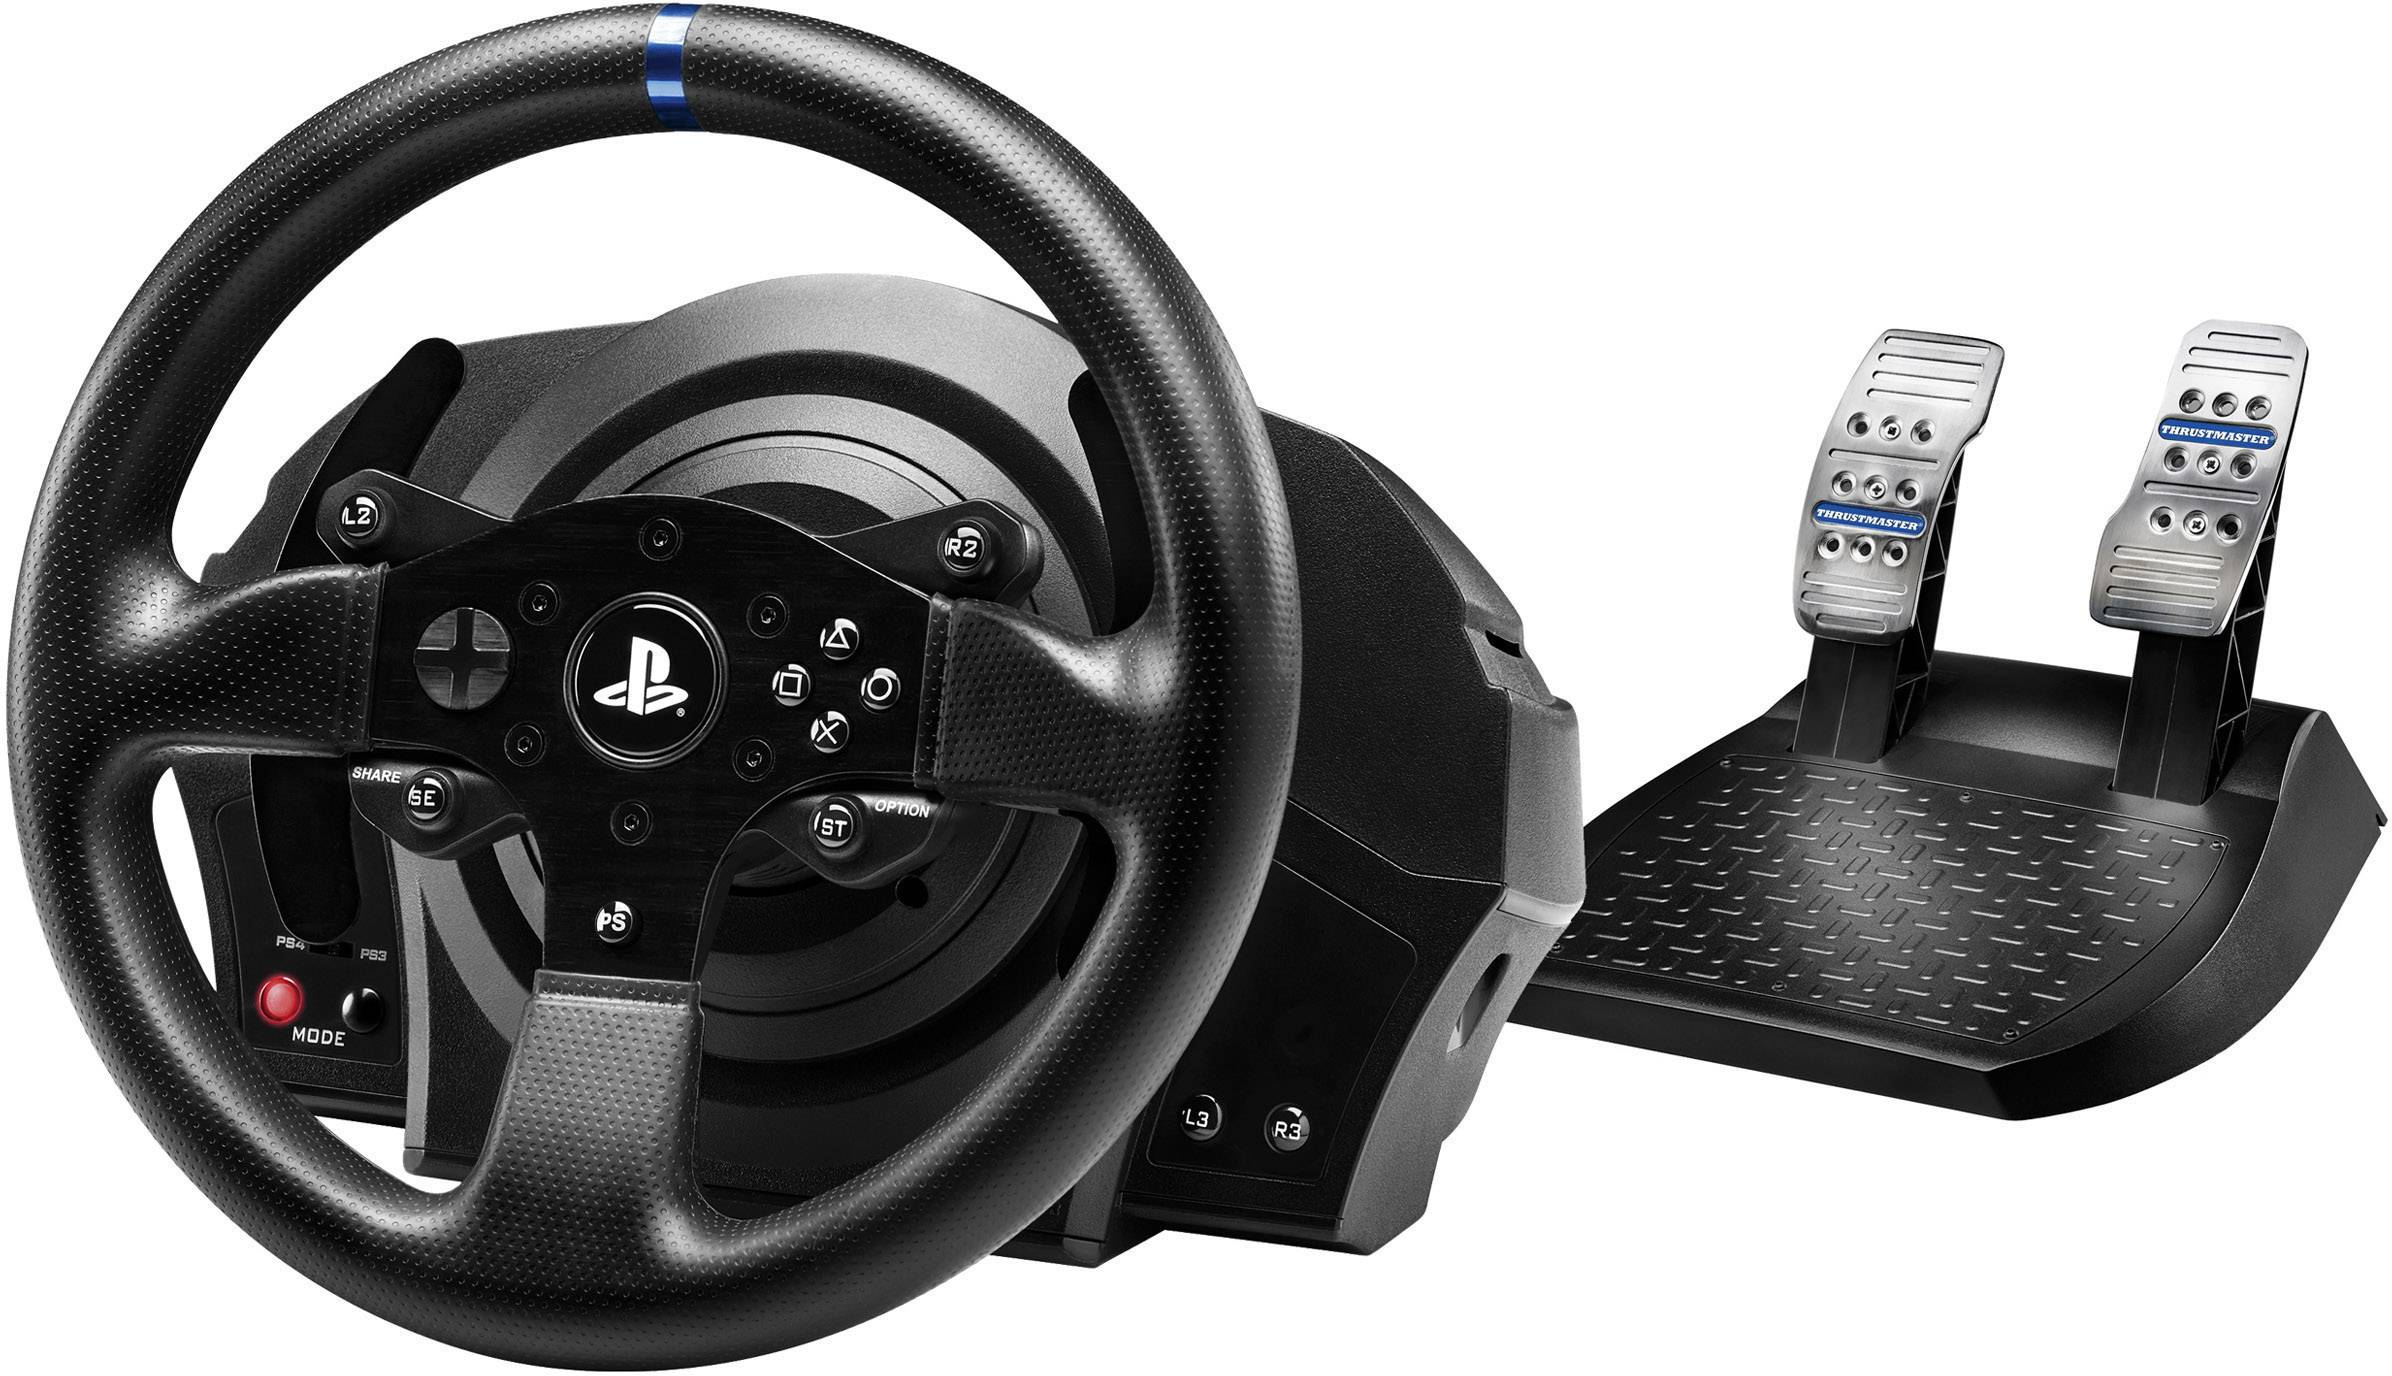 thrustmaster t300 rs racing wheel lenkrad playstation 4 playstation 3 pc schwarz kaufen. Black Bedroom Furniture Sets. Home Design Ideas